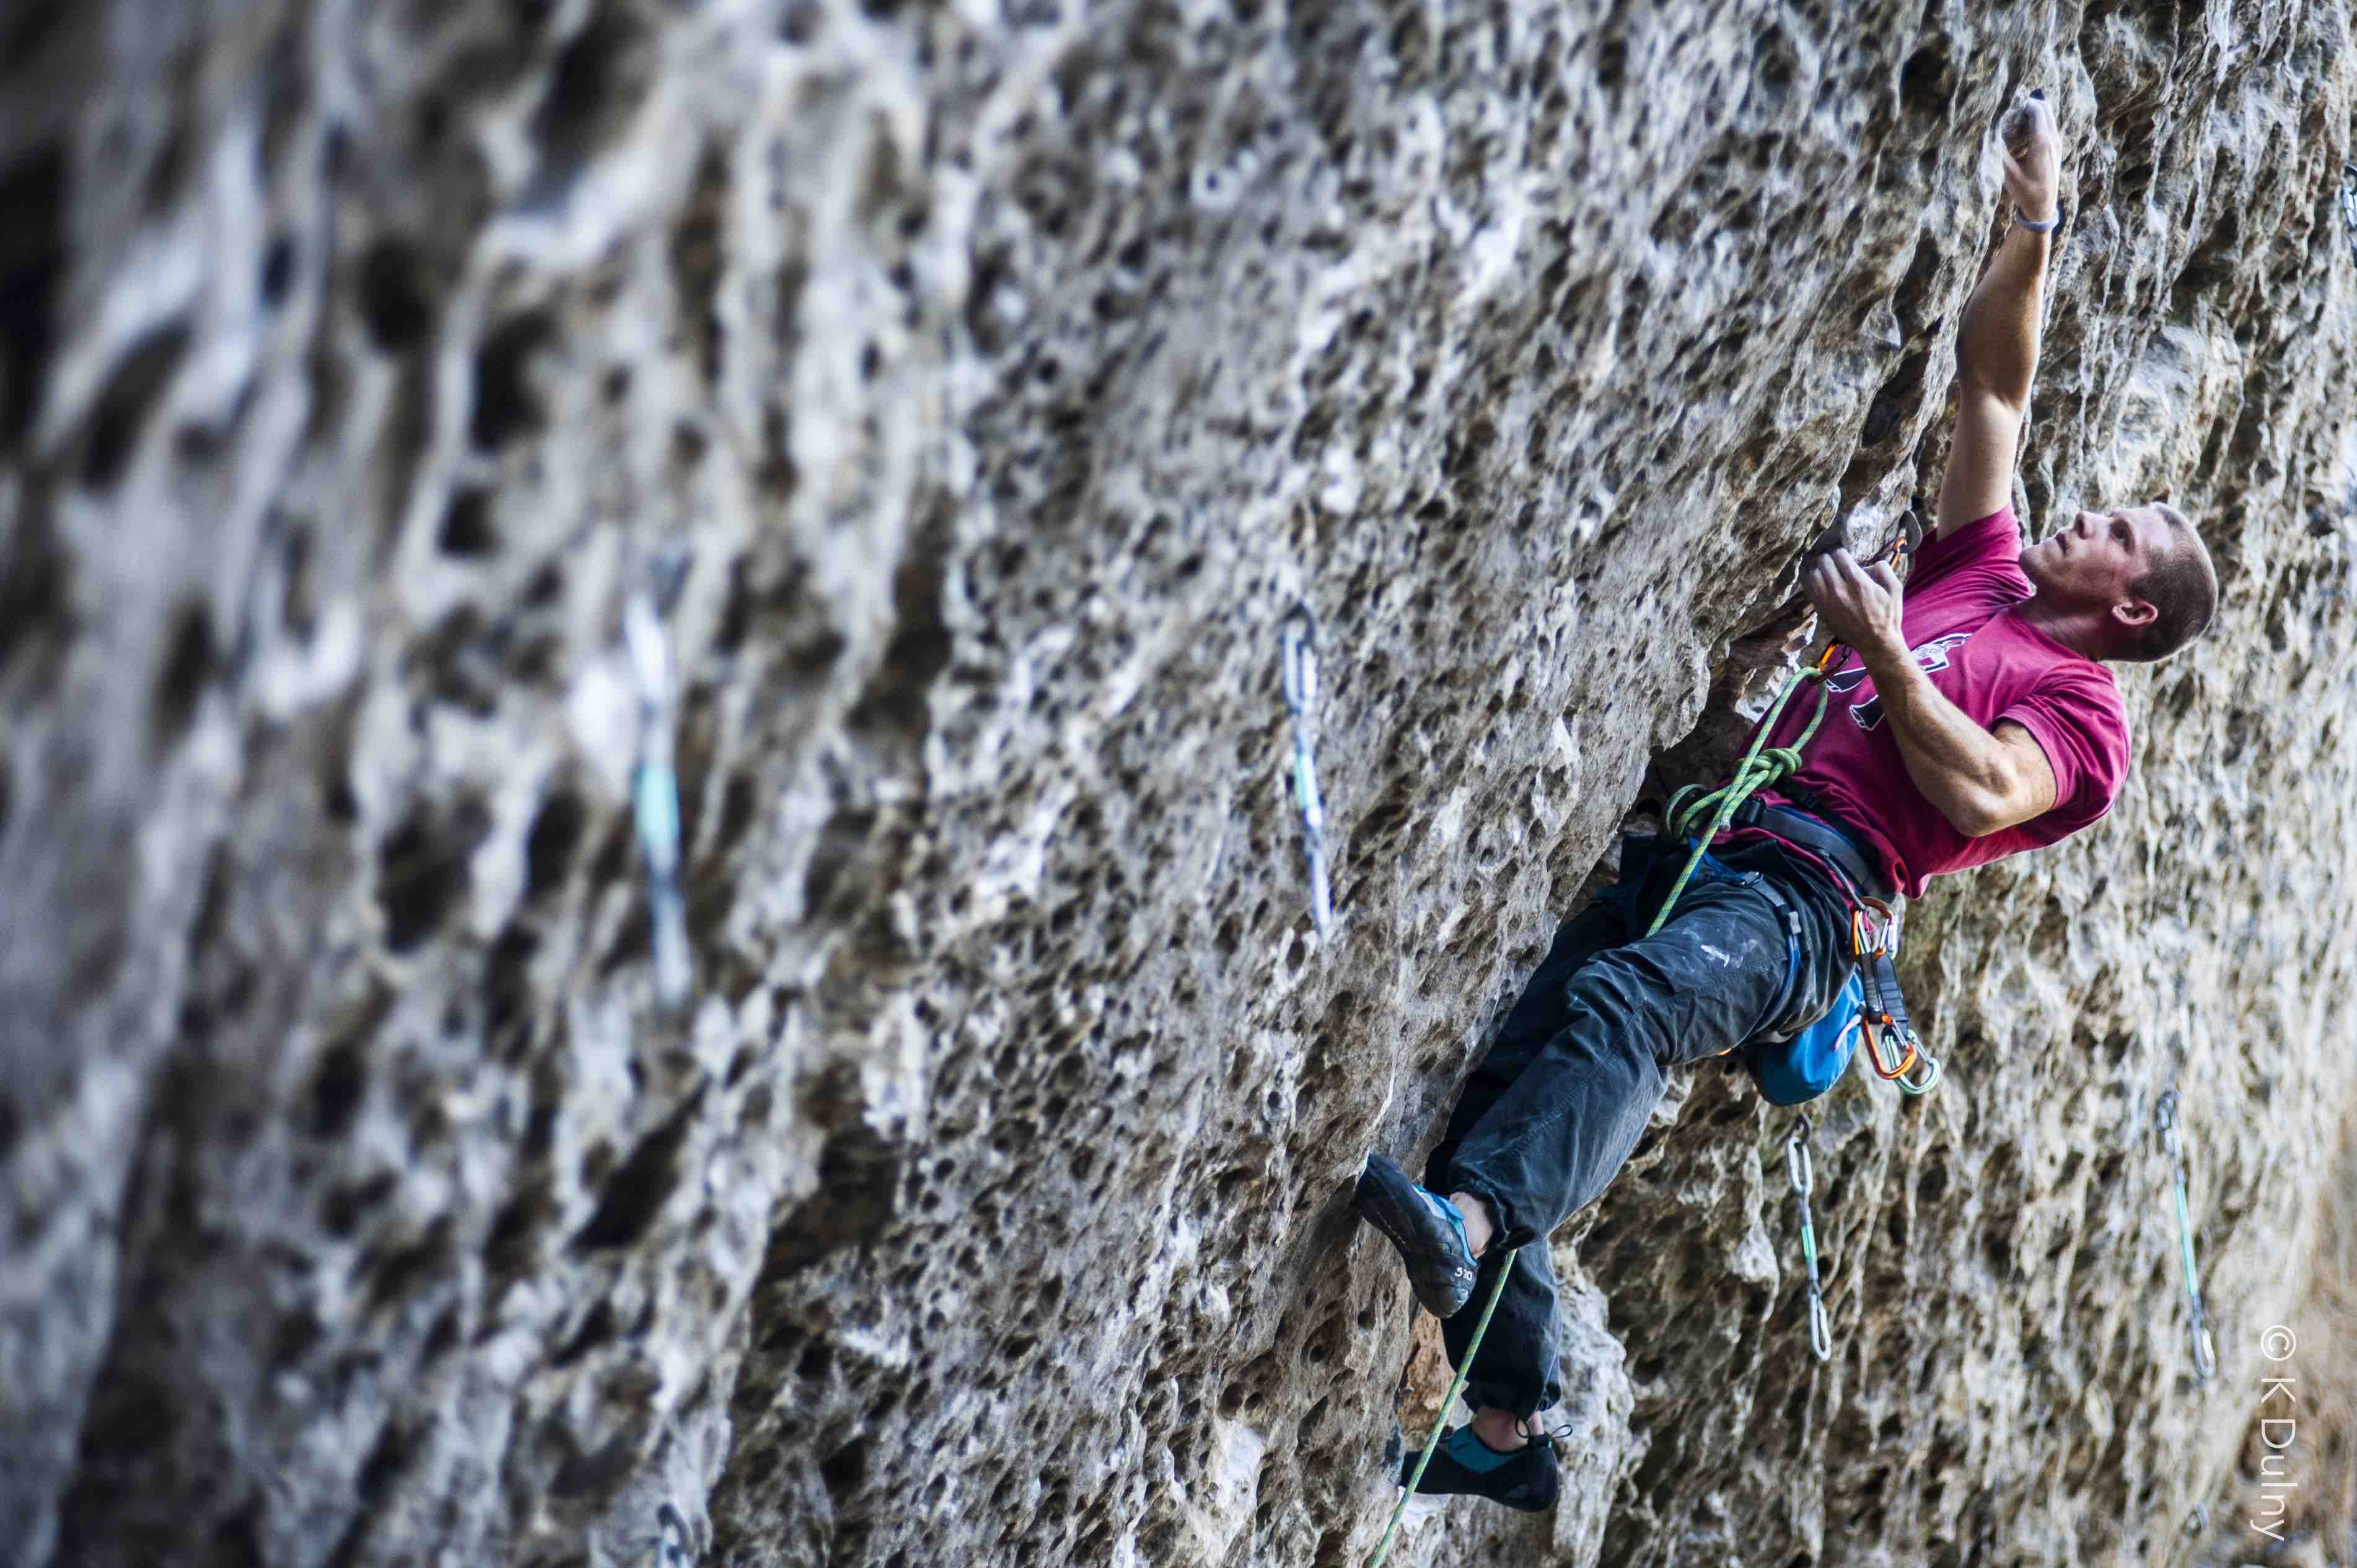 Michael Hauck Rock Climbing Outside